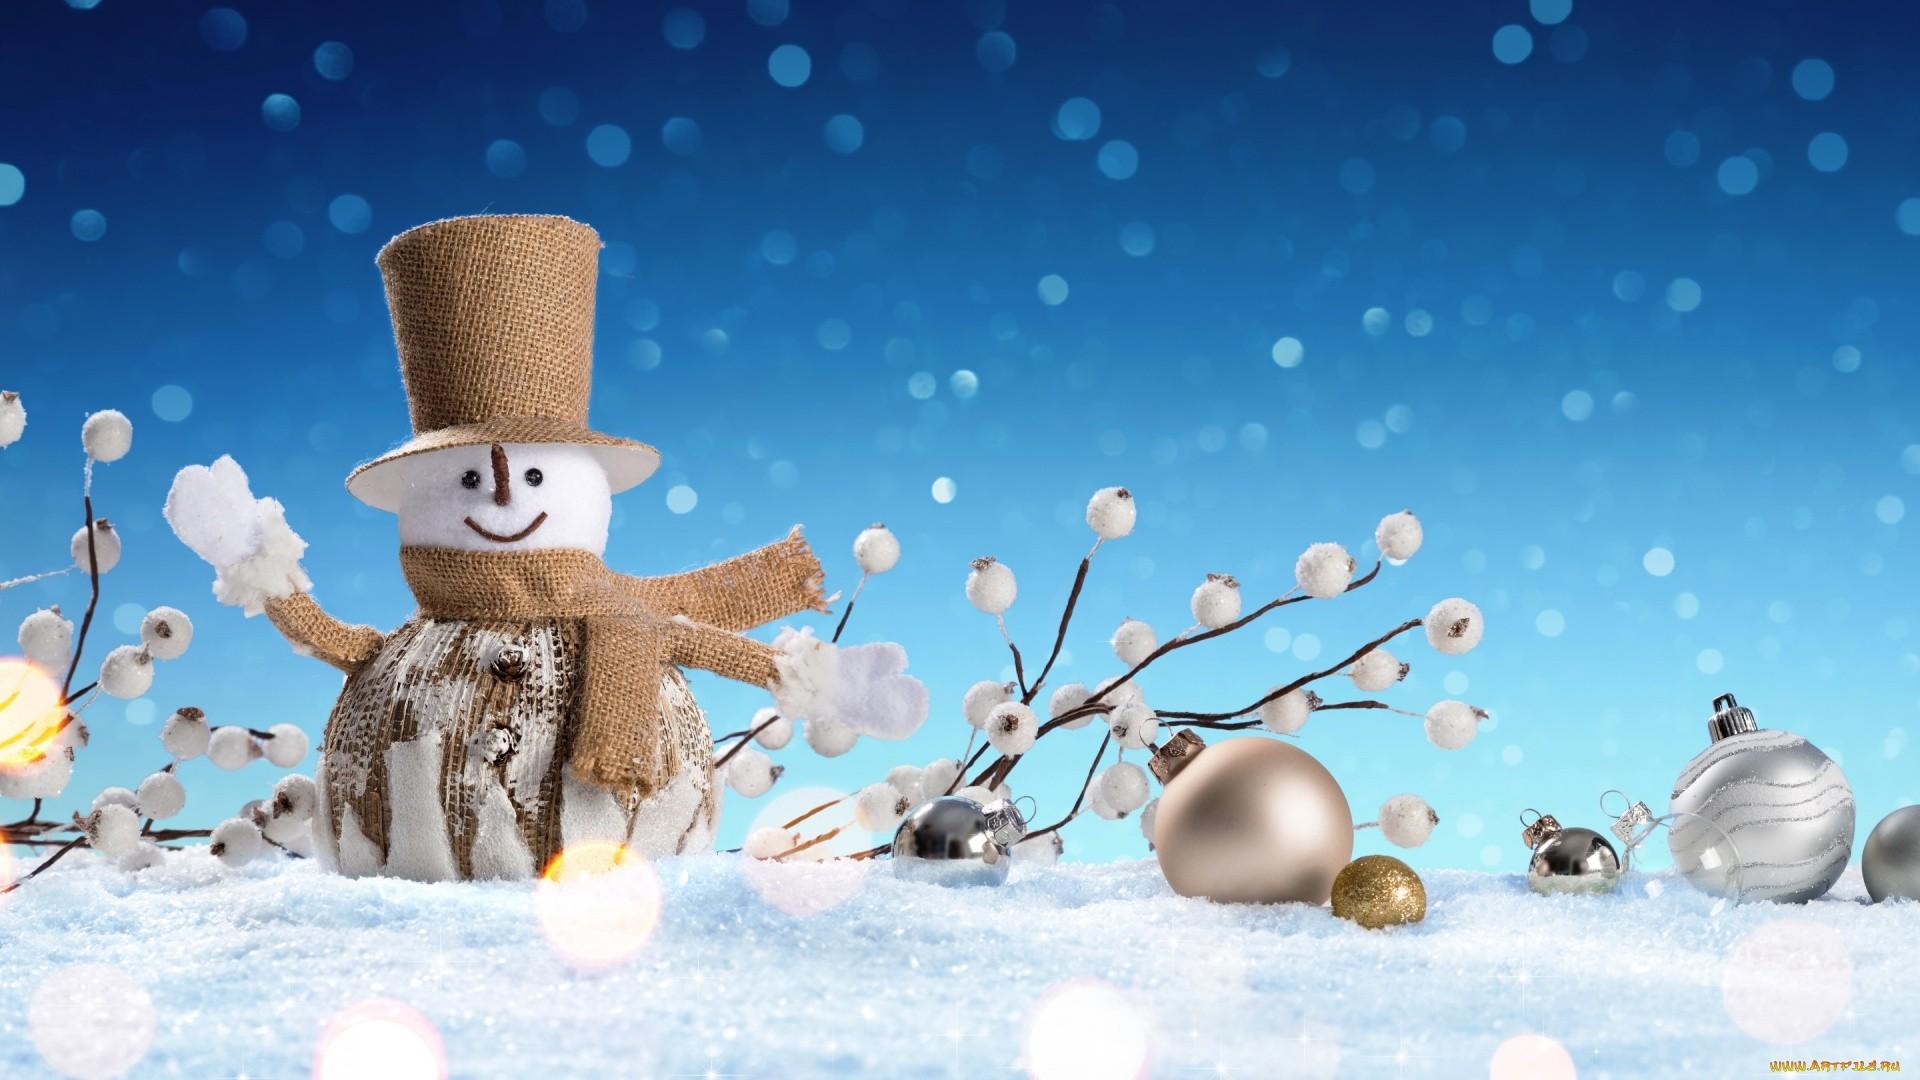 Snowman Download Wallpaper